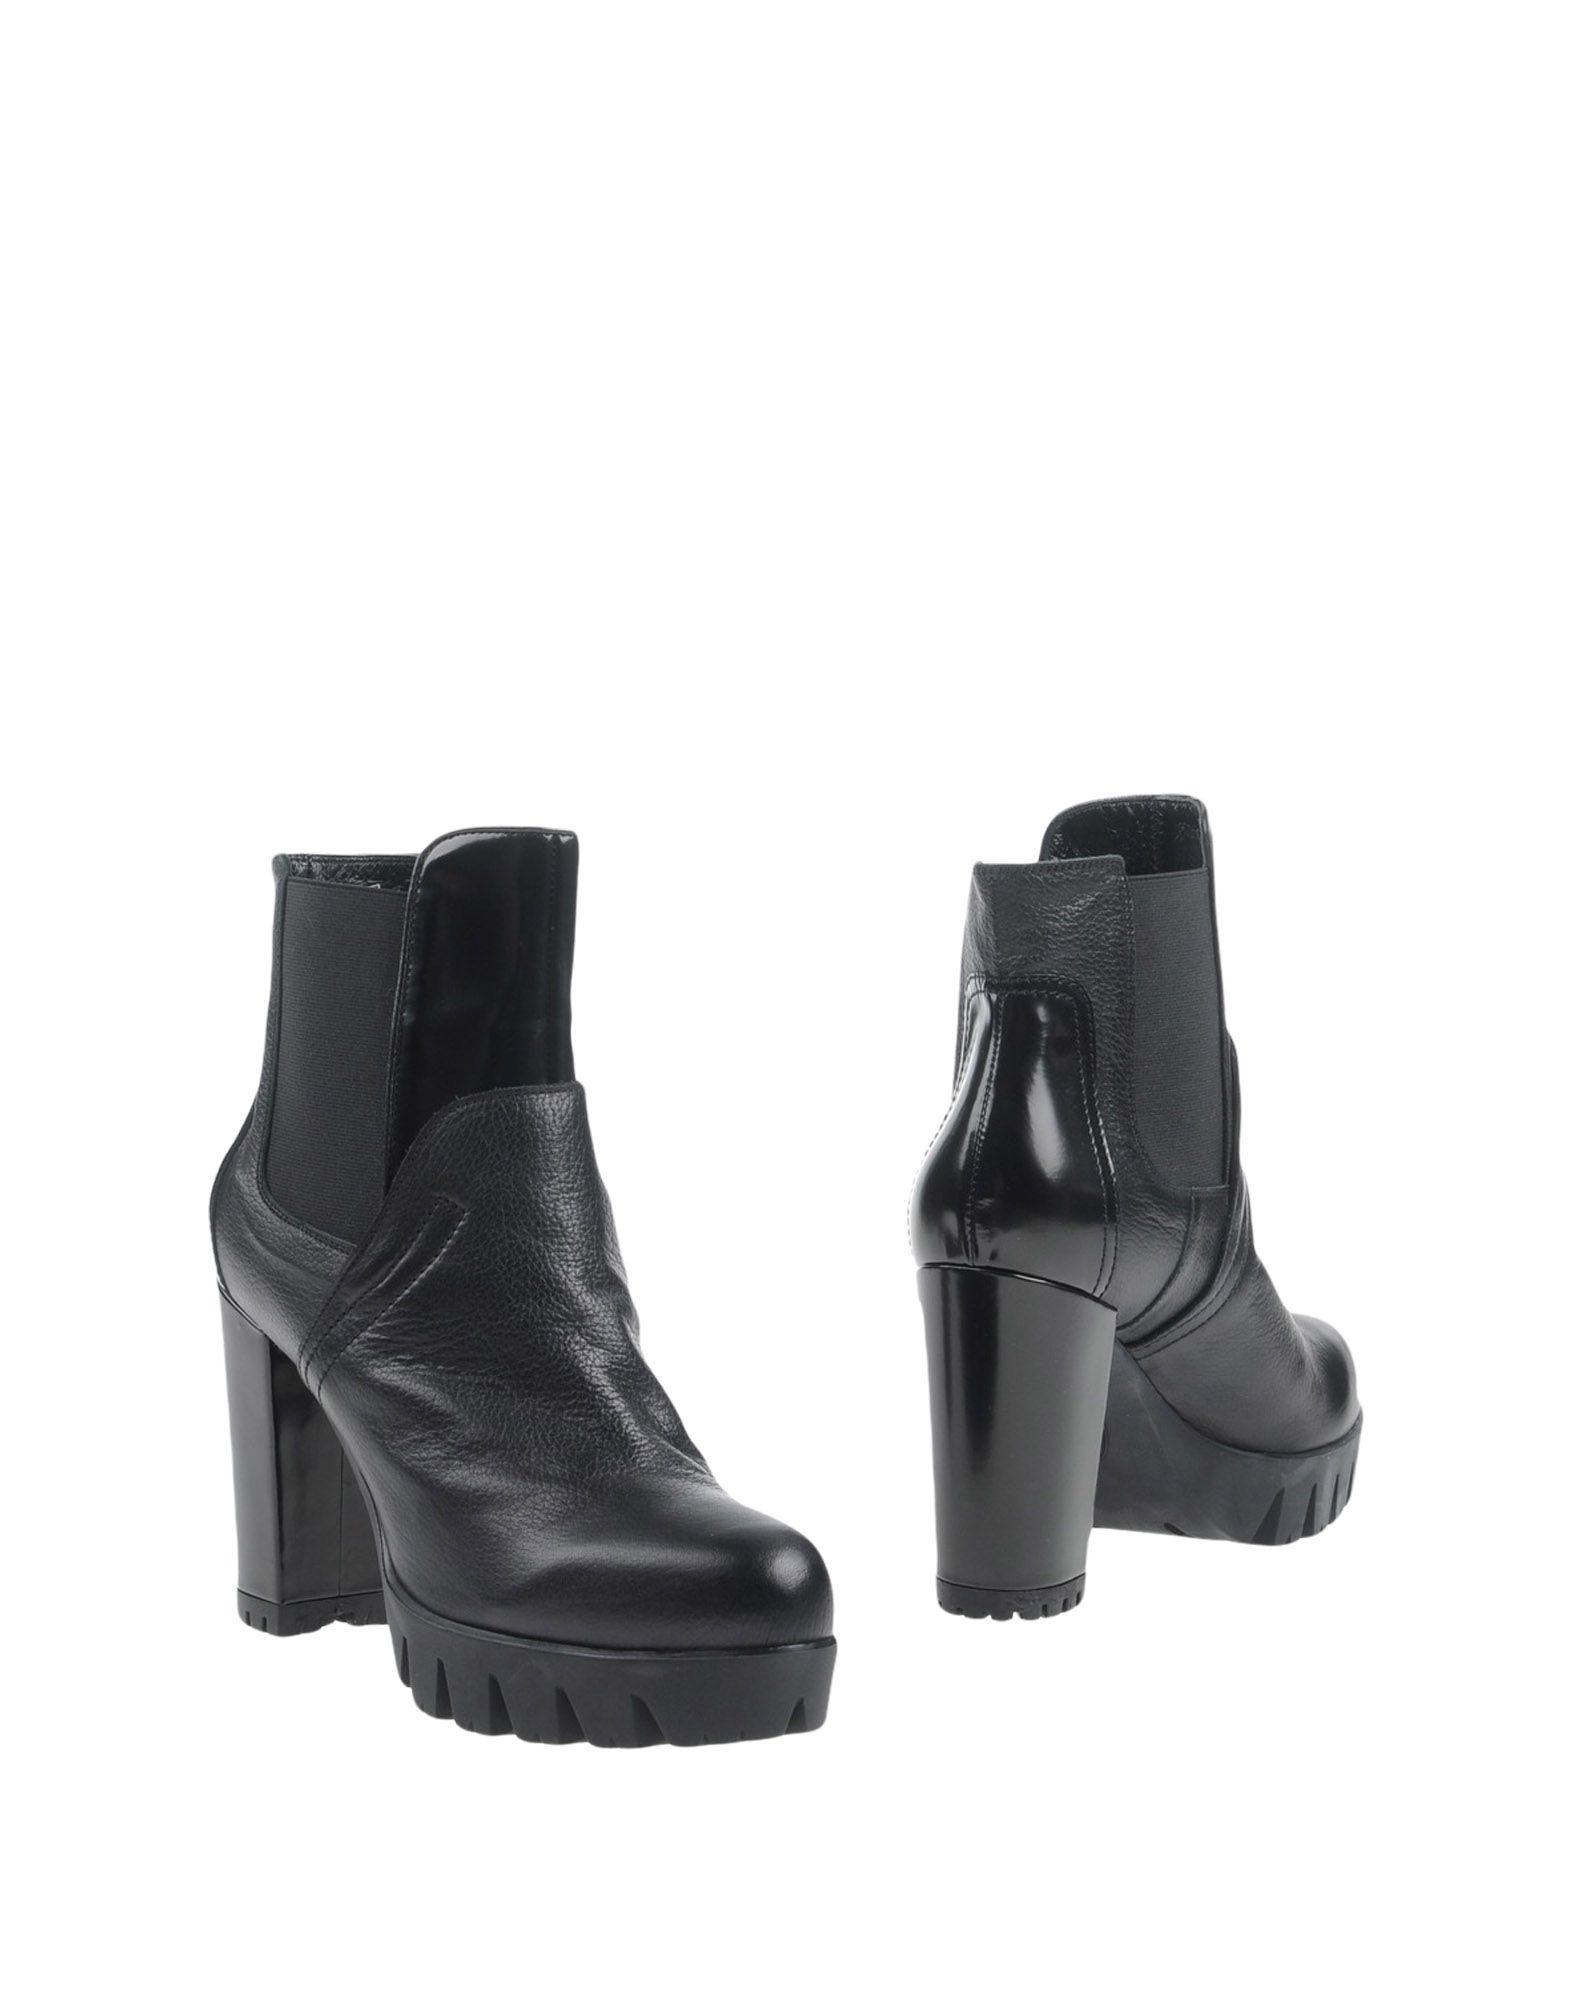 GUIDO SGARIGLIA Полусапоги и высокие ботинки guido sgariglia низкие кеды и кроссовки